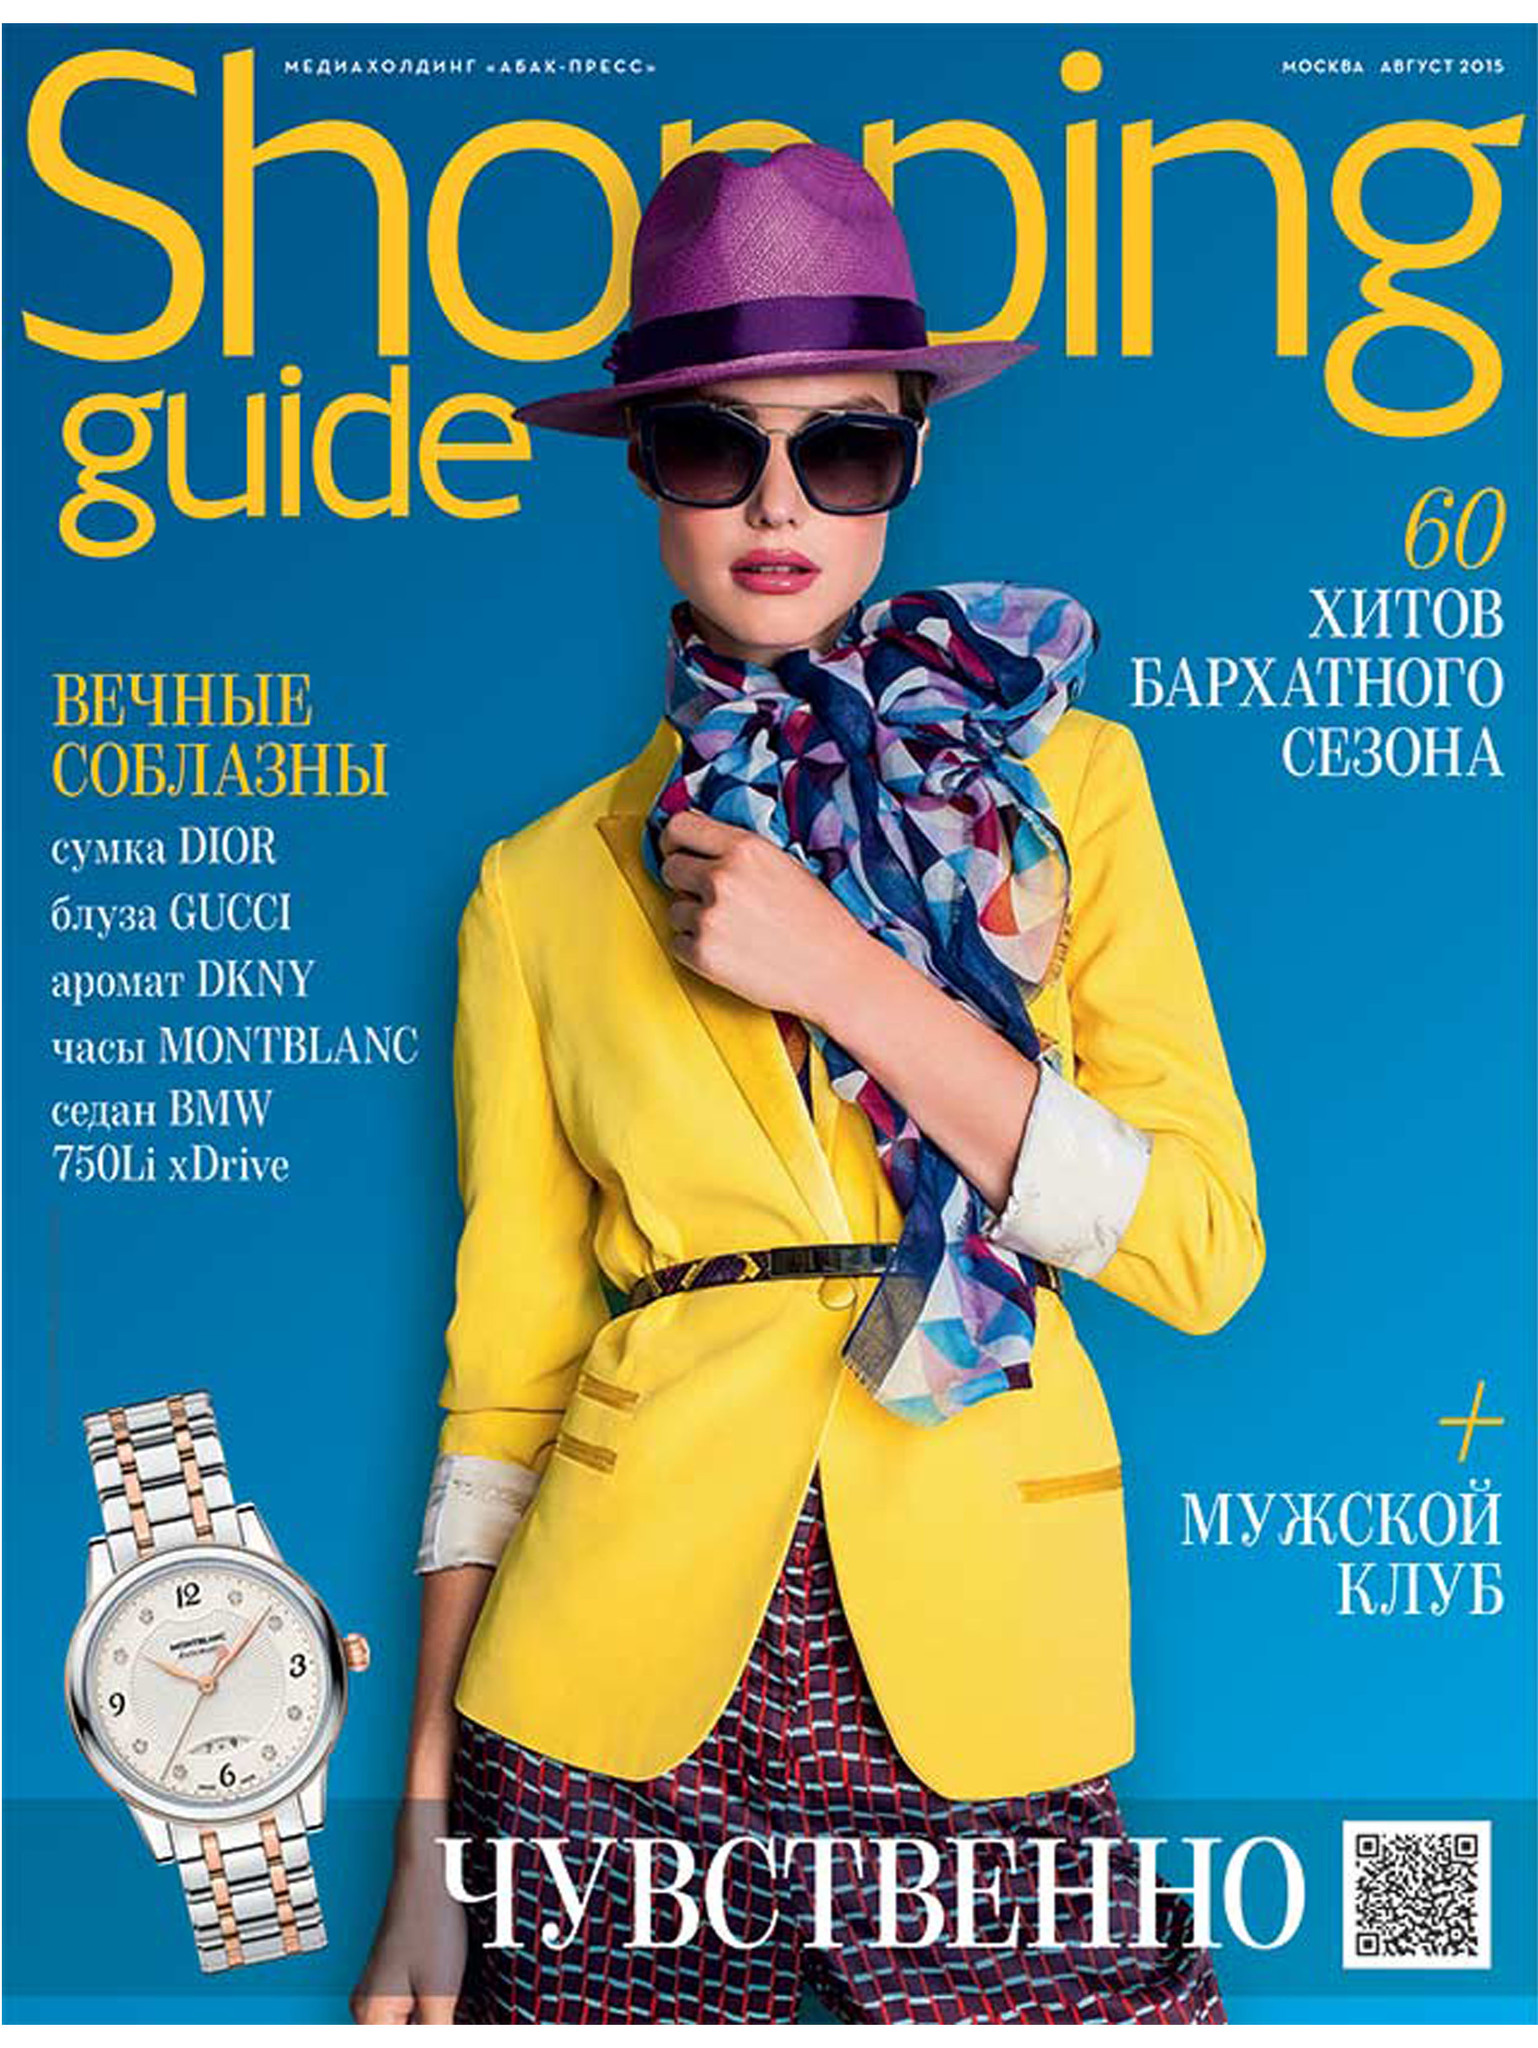 Серьги от Jennifer Loiselle в журнале Shopping Guide август 2015 г.